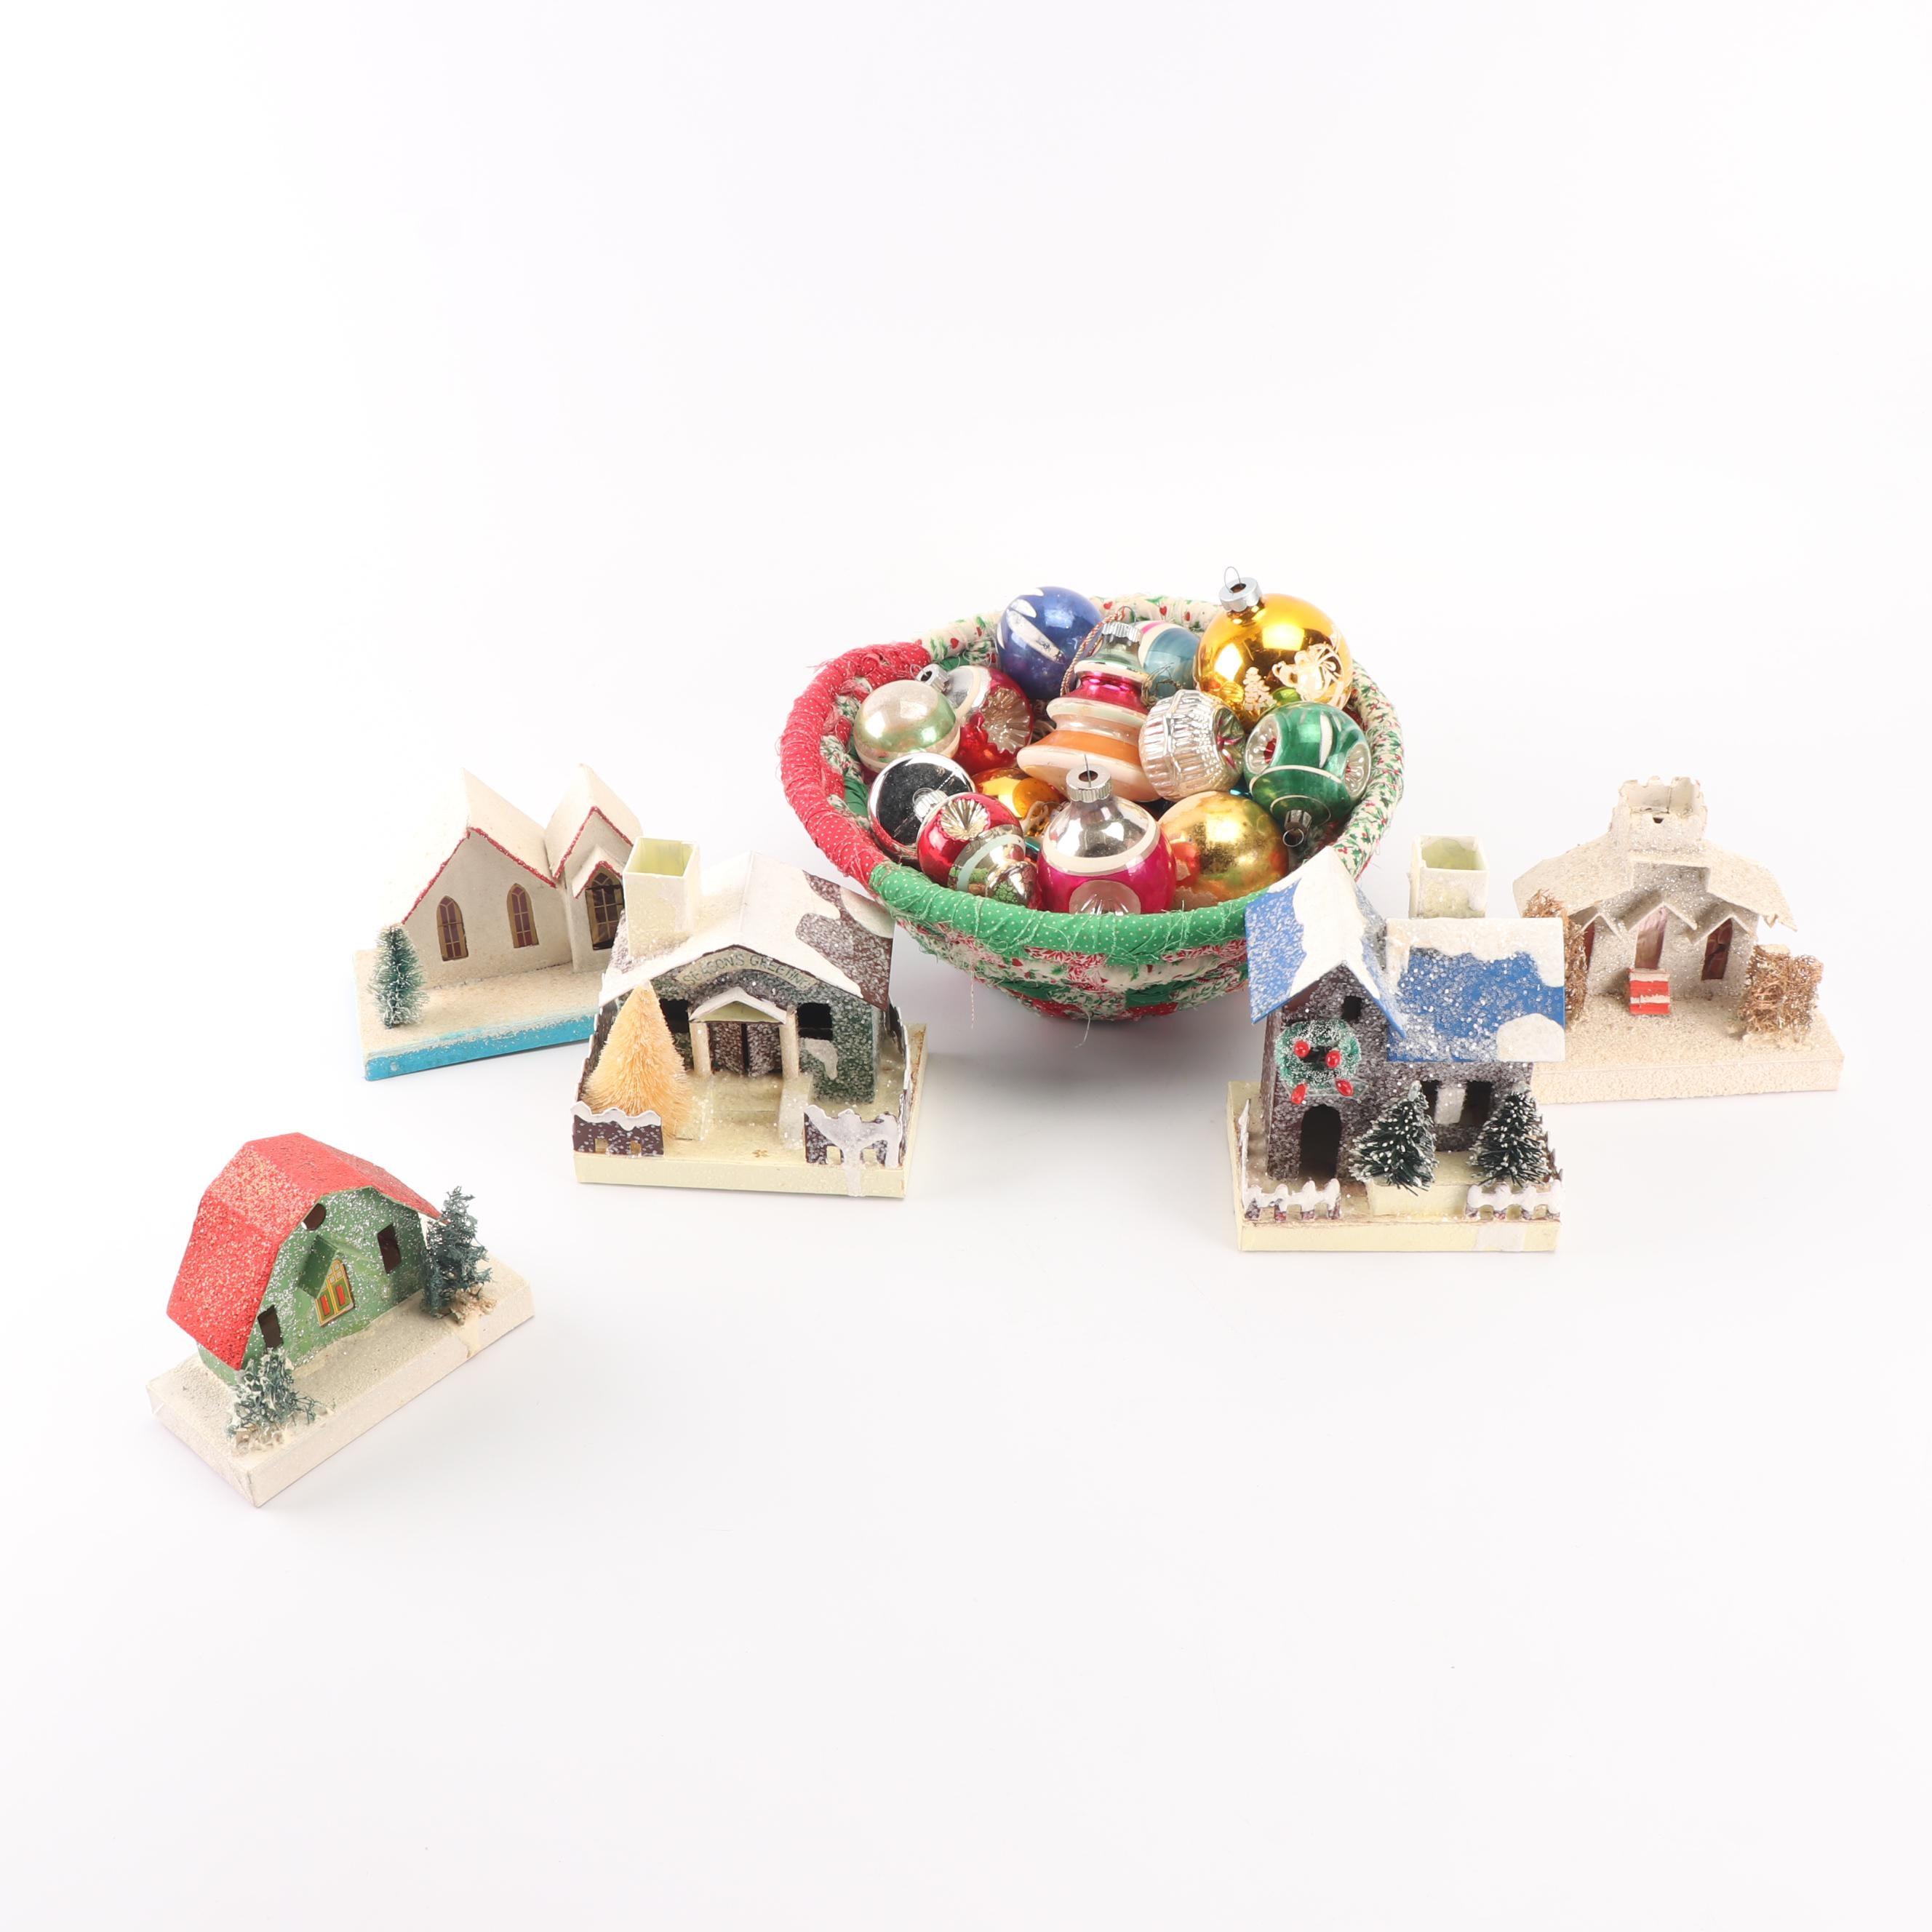 Glass Christmas Ornaments, Basket, and Putz Houses